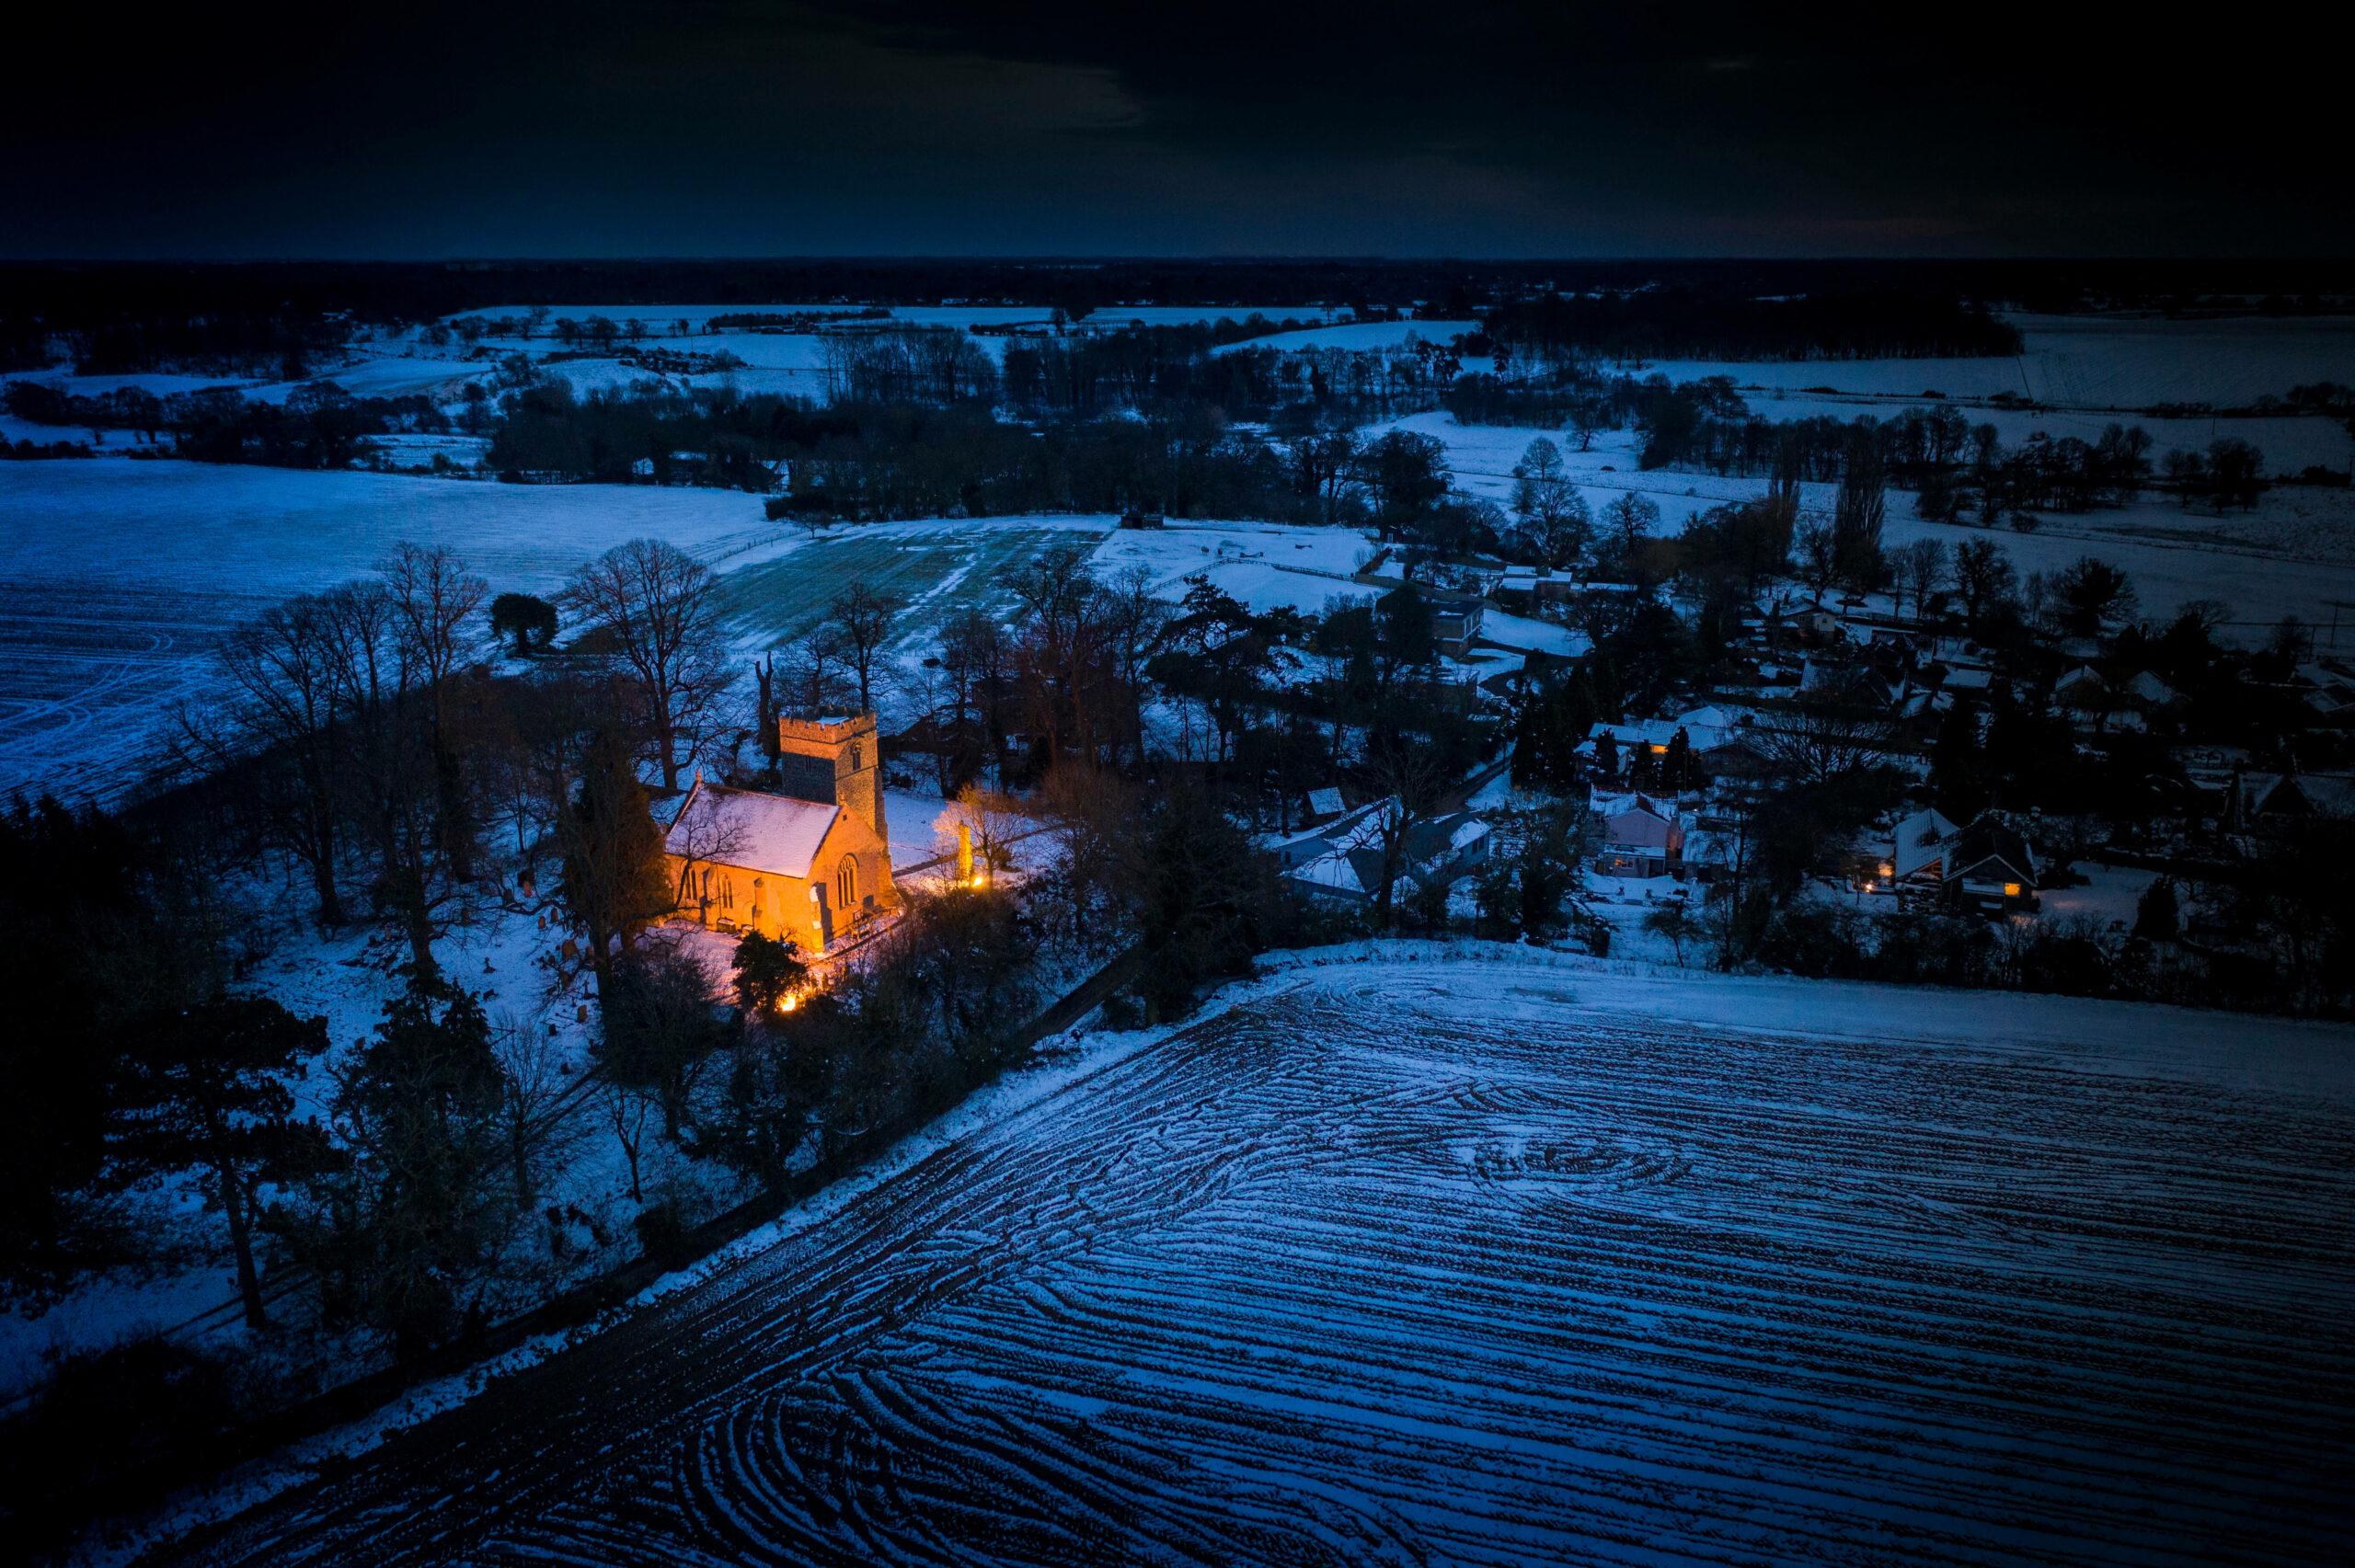 Playford Church illuminated in the winter night